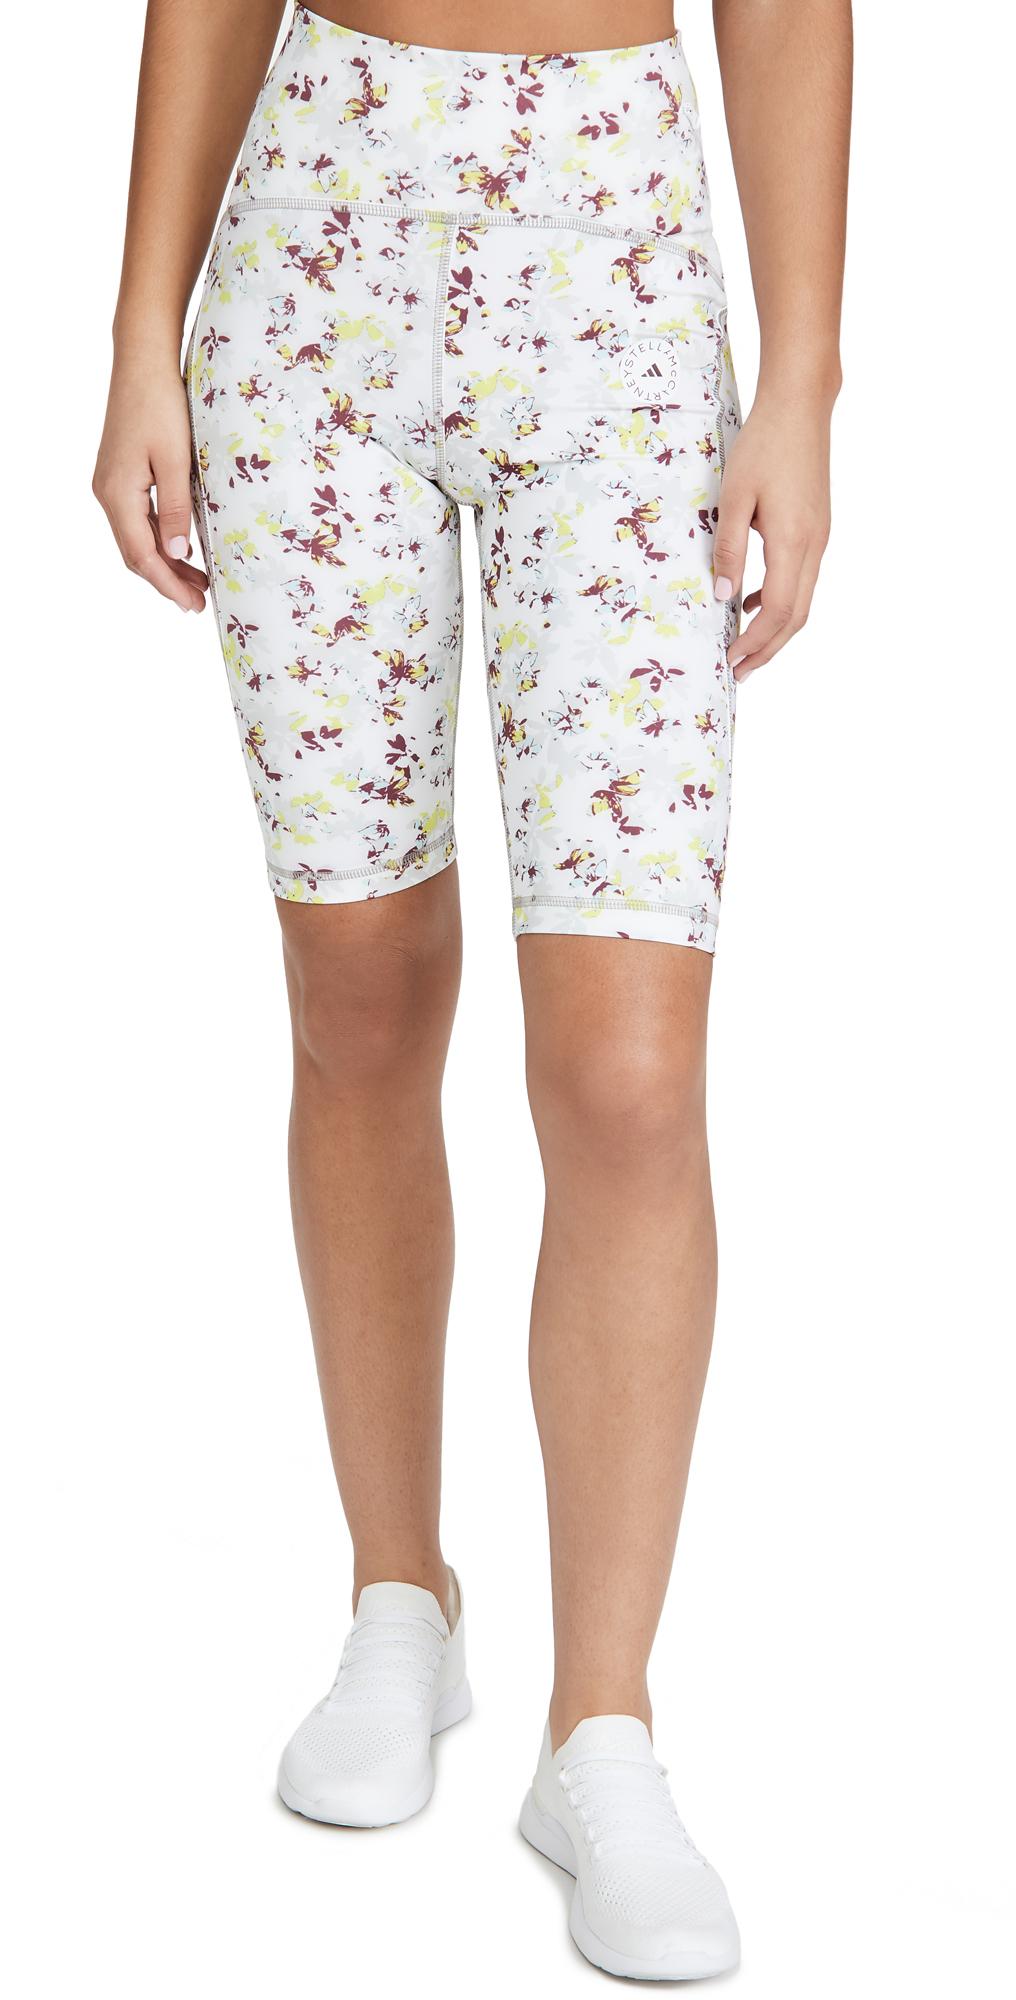 adidas by Stella McCartney True Purpose Cycling Shorts